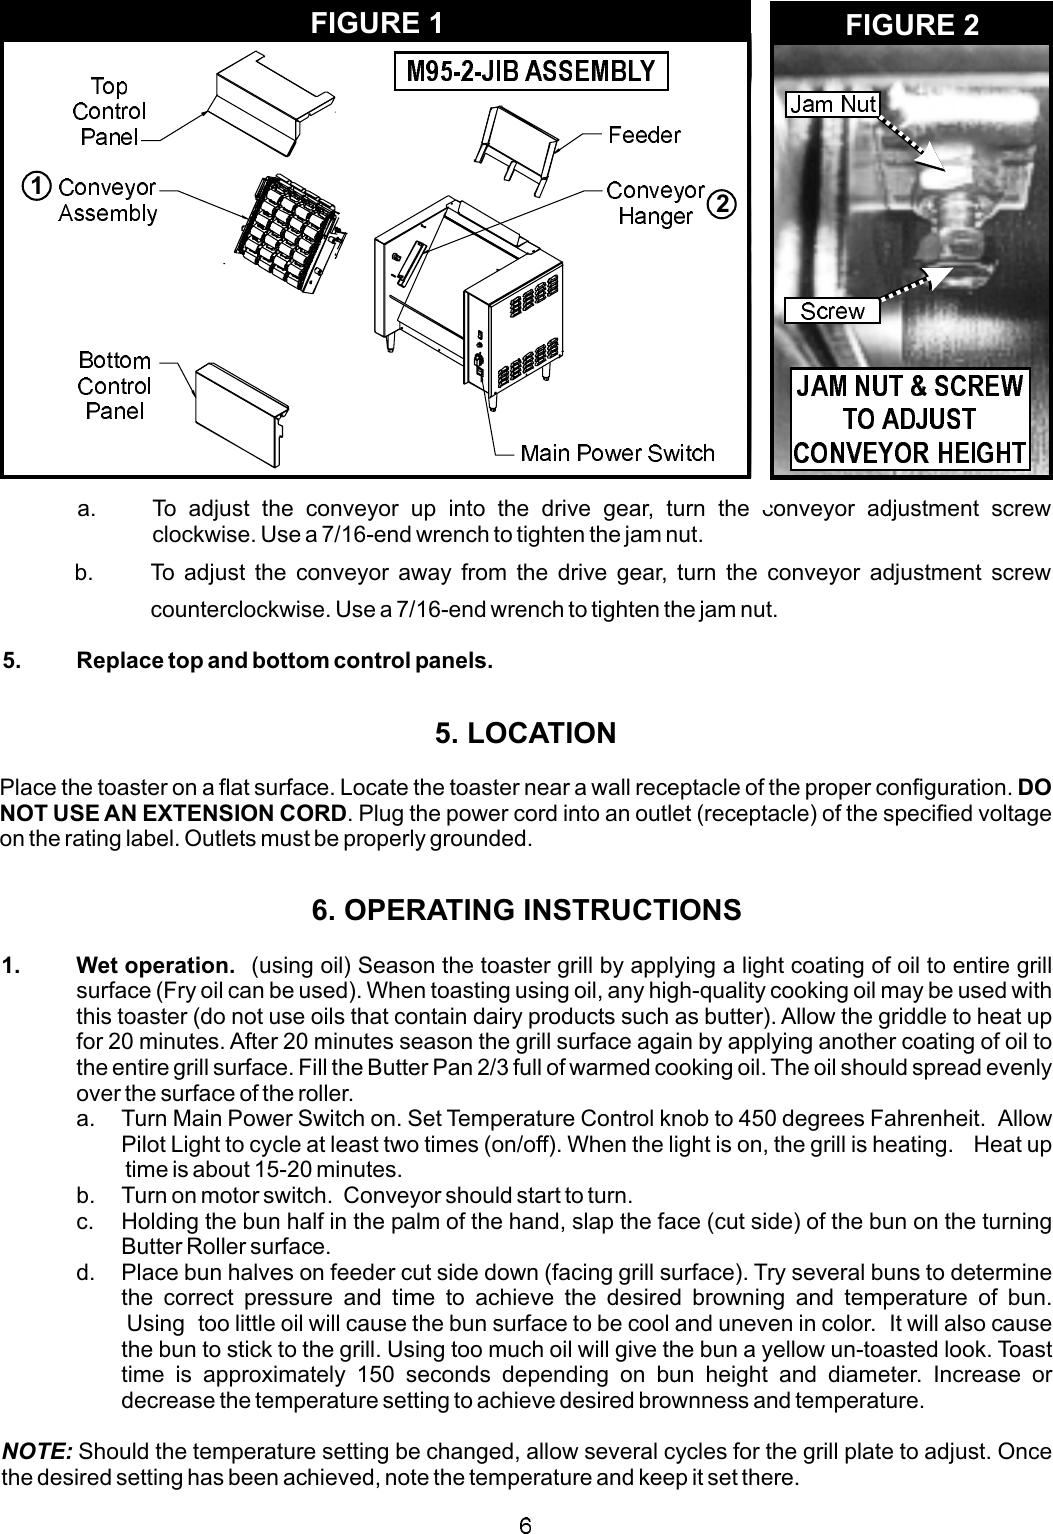 [DIAGRAM_4FR]  Apw Wyott M95 2 Jib Users Manual | A Wyott M95 Wiring Diagram |  | UserManual.wiki